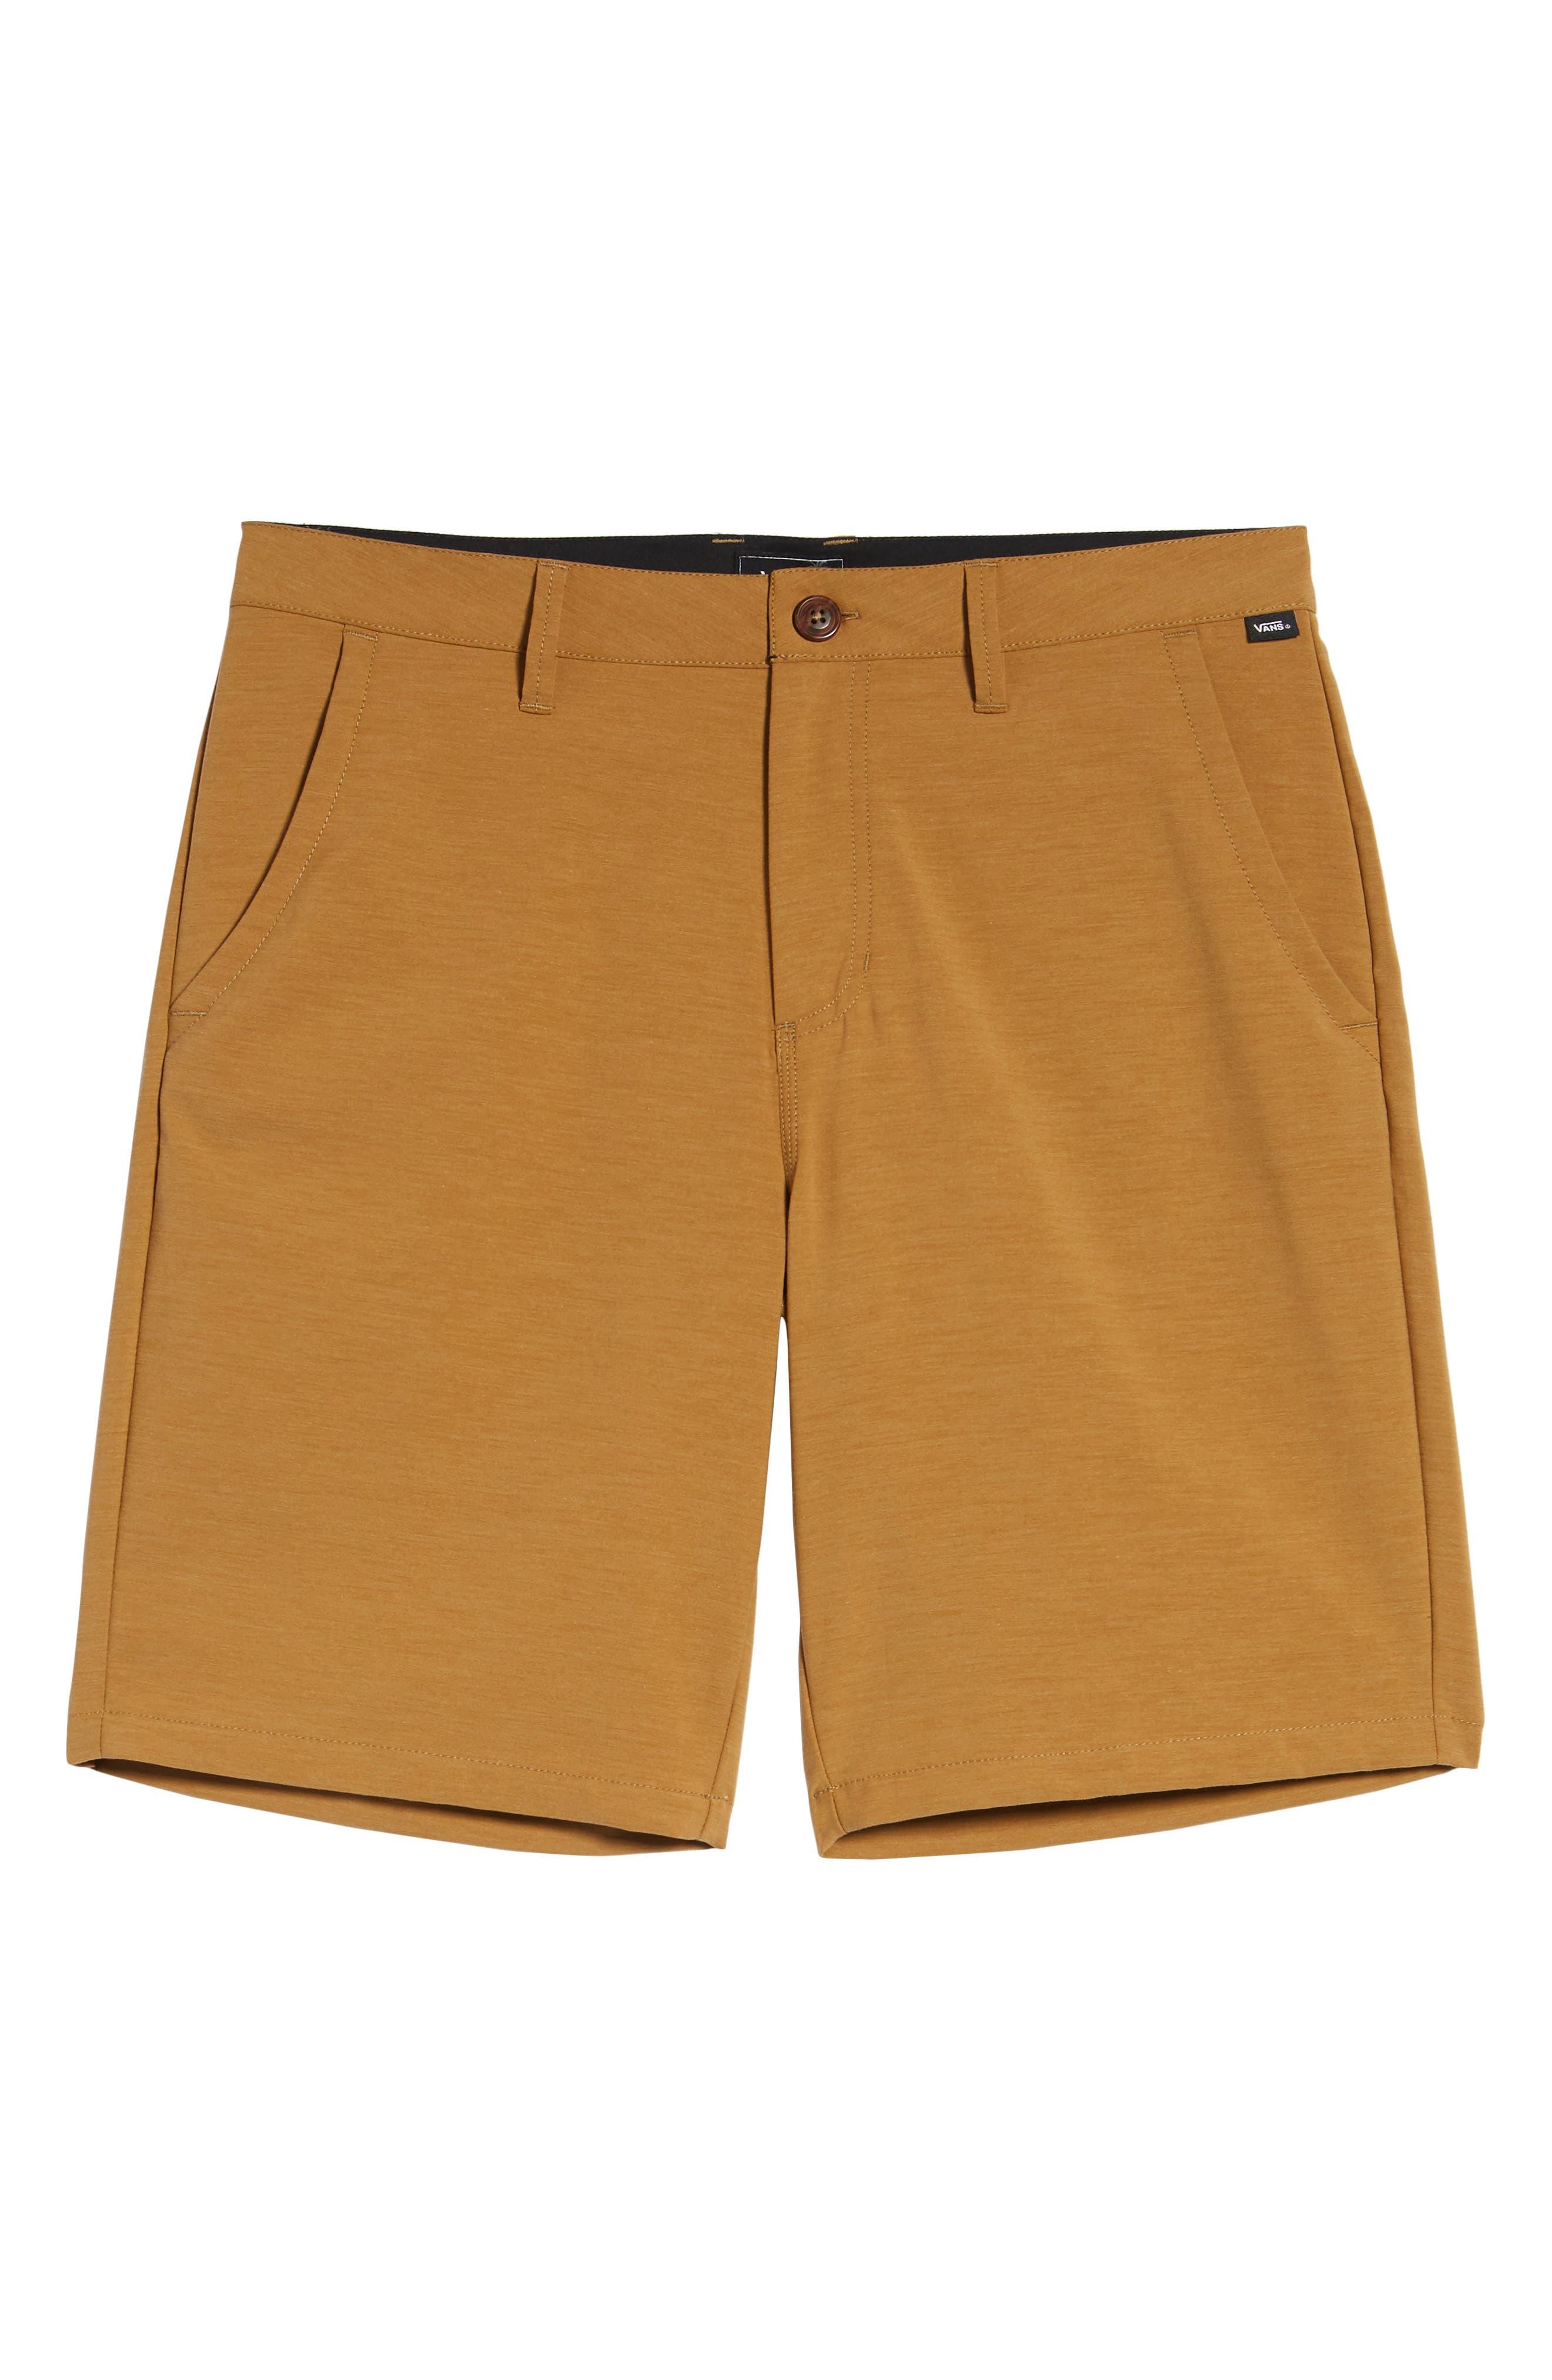 Authentic MicroPlush Decksider Shorts,                             Alternate thumbnail 6, color,                             210